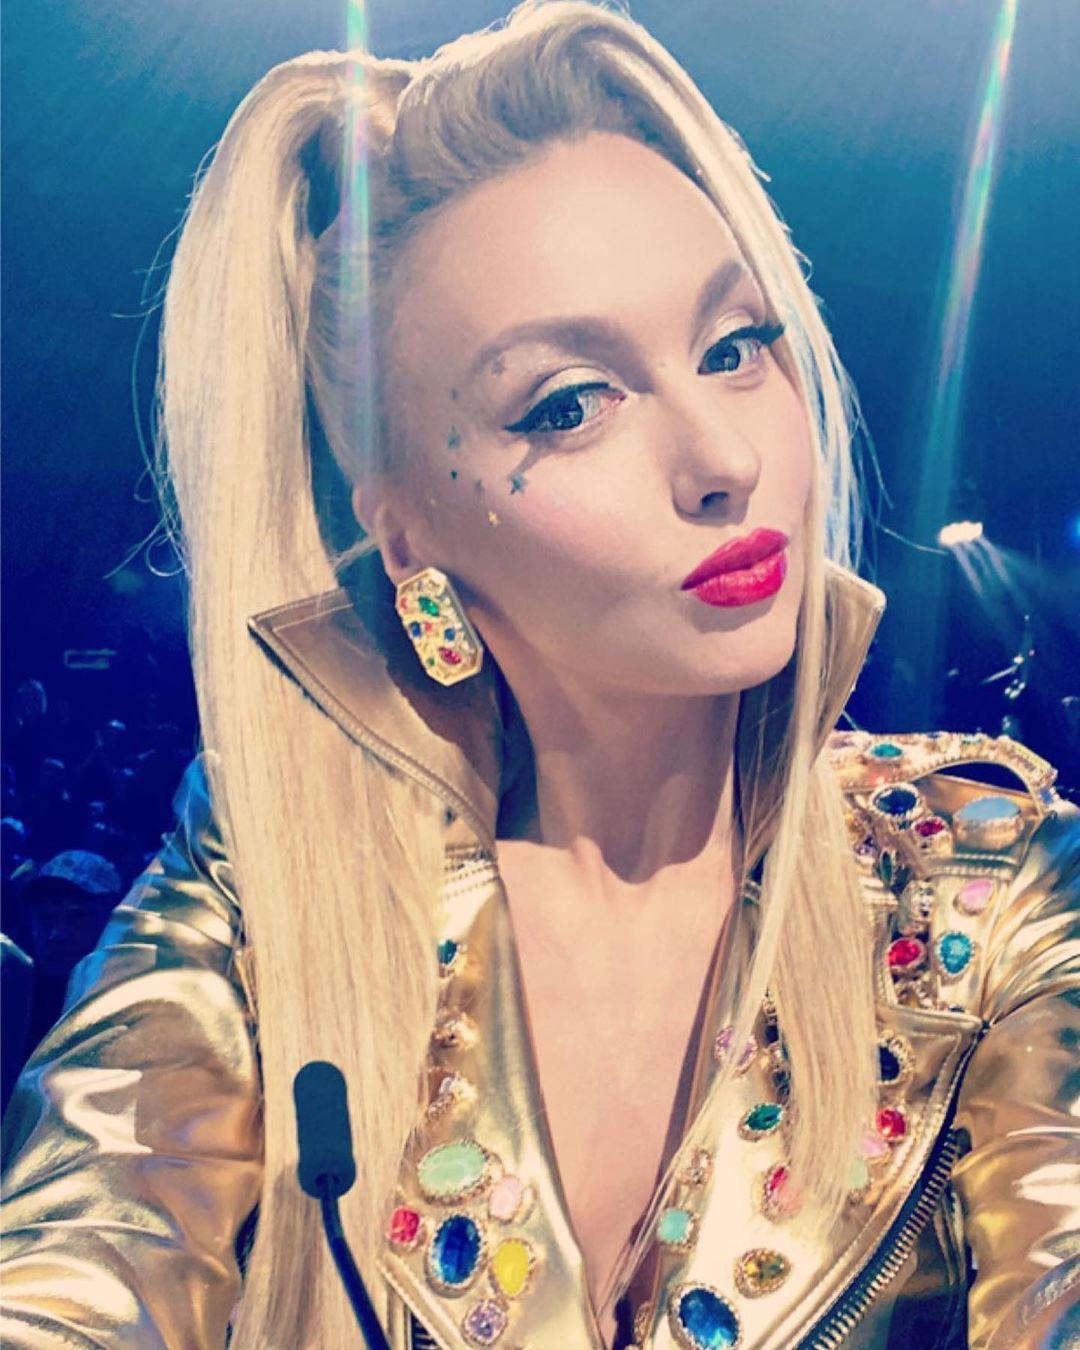 Полякова прогулялась по Майами в спортивном костюме без макияжа